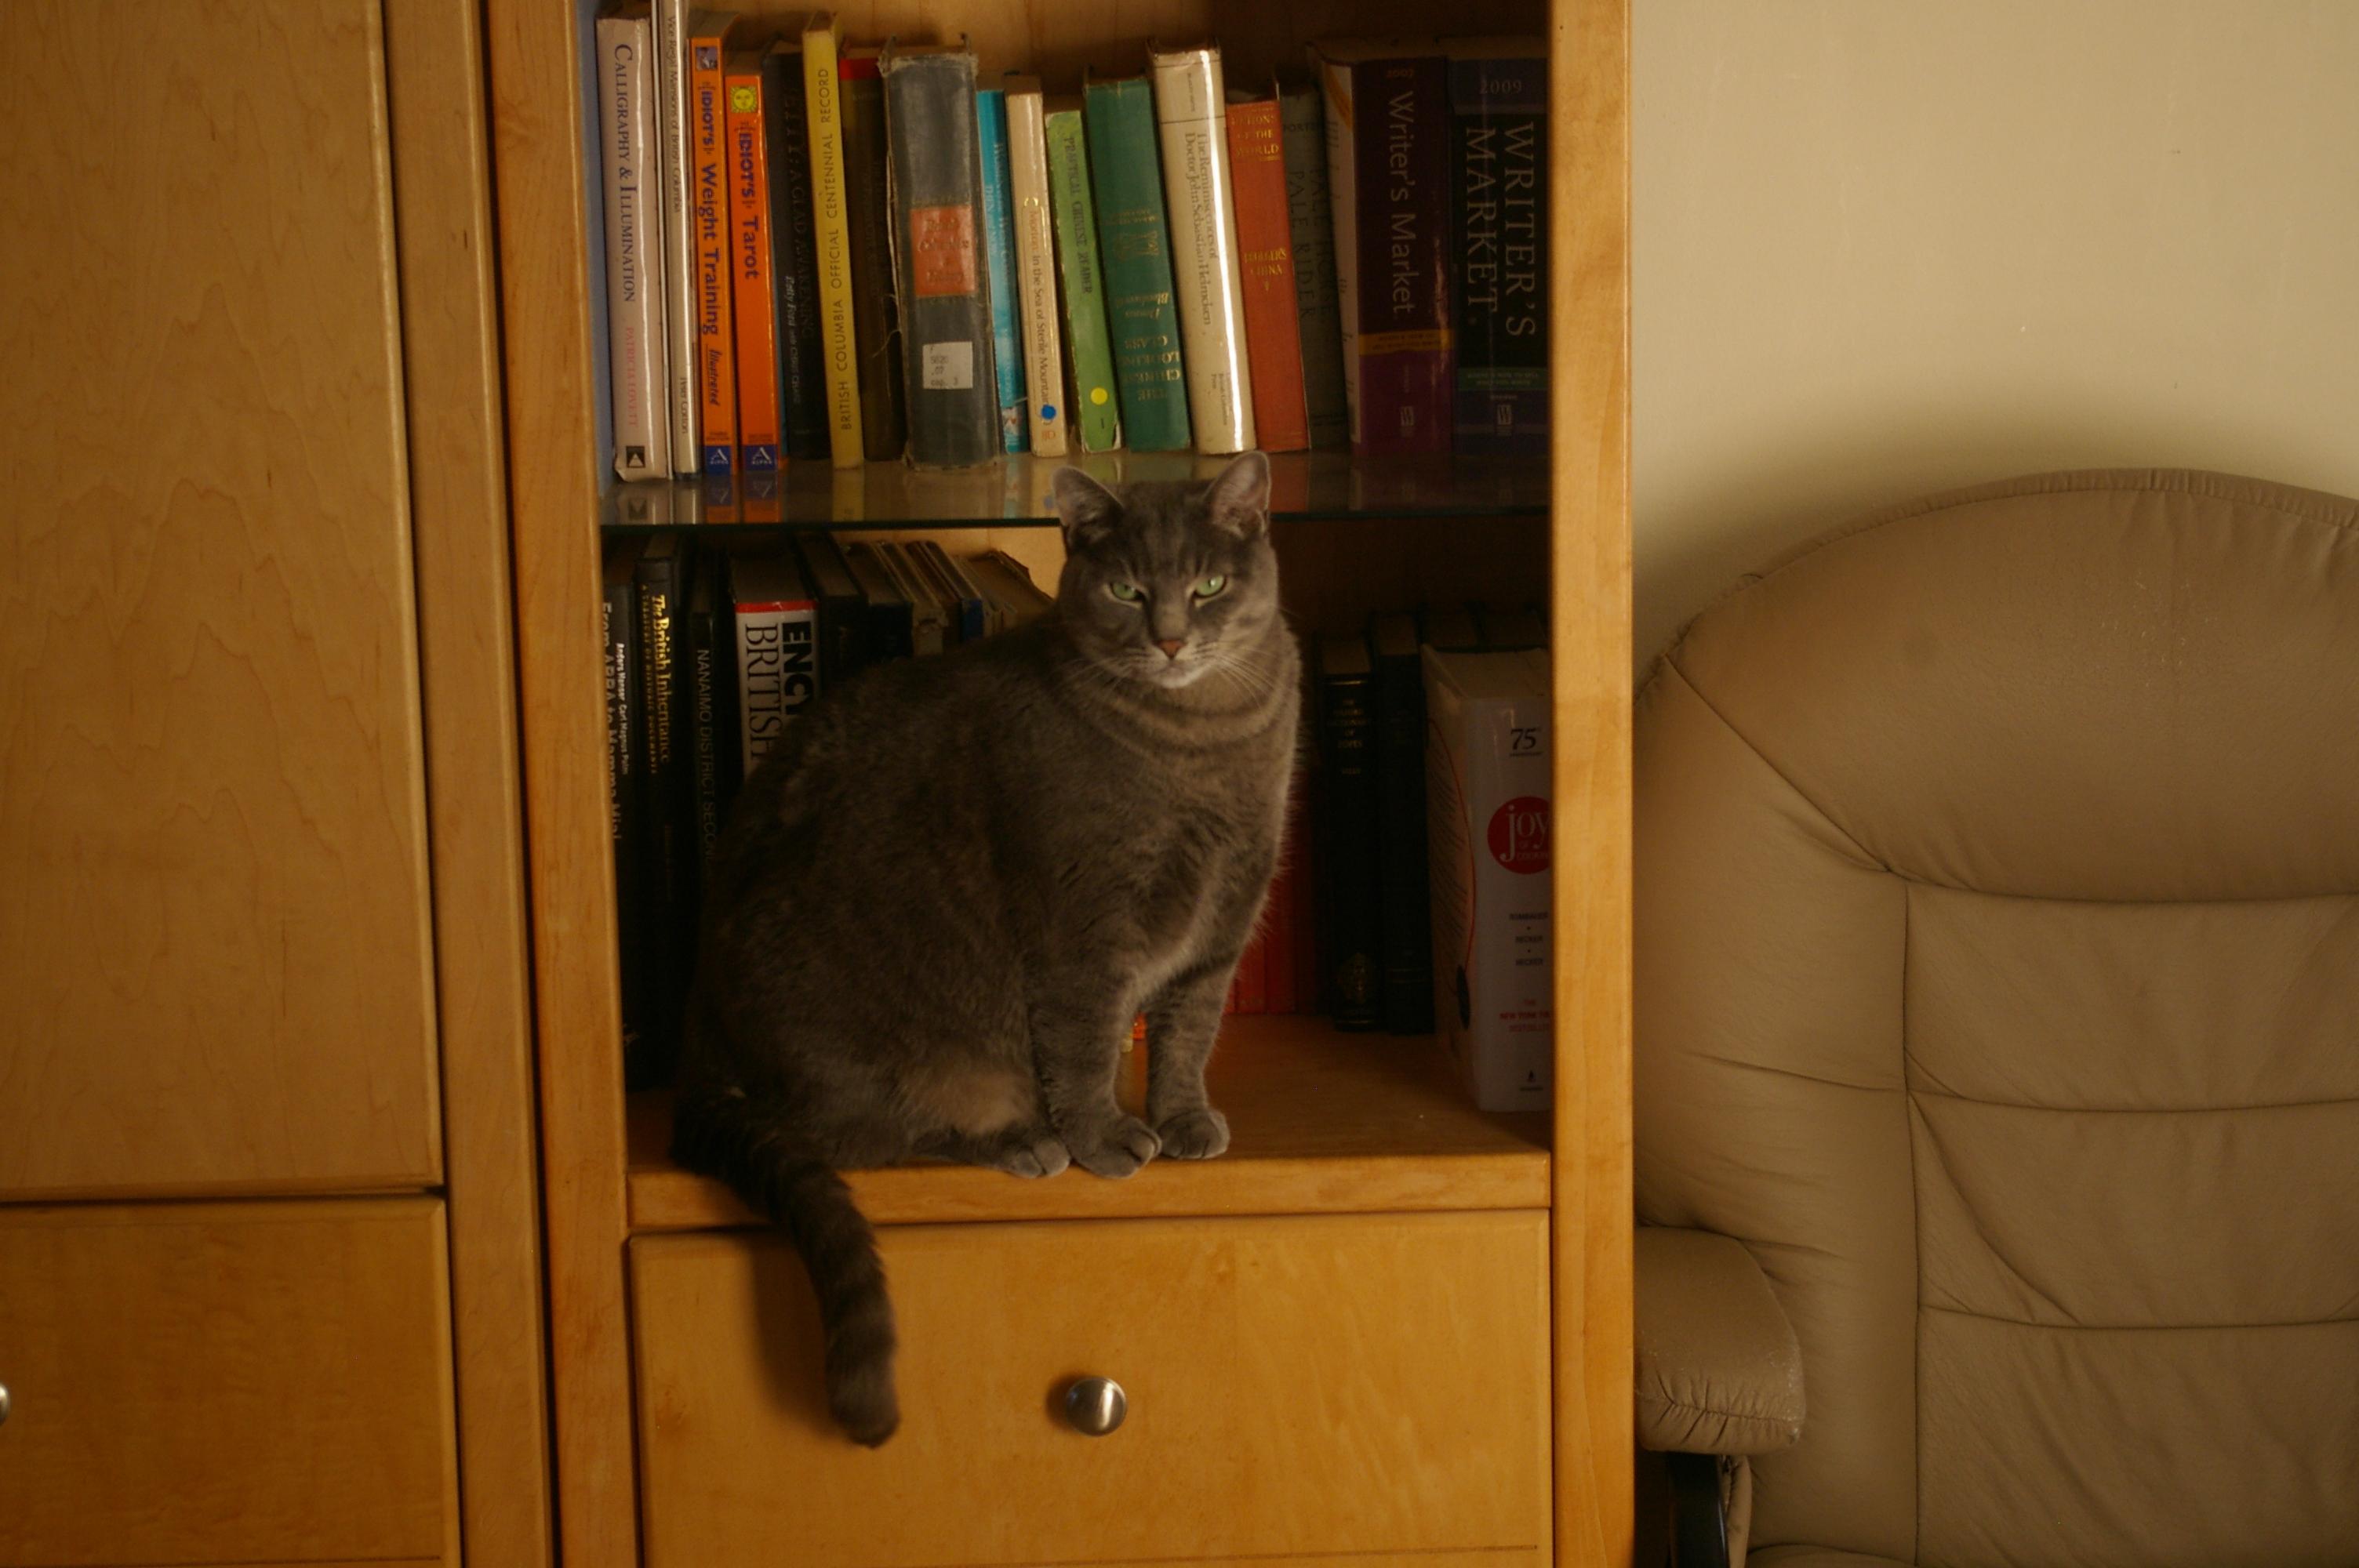 My cat Khan on the bookshelf